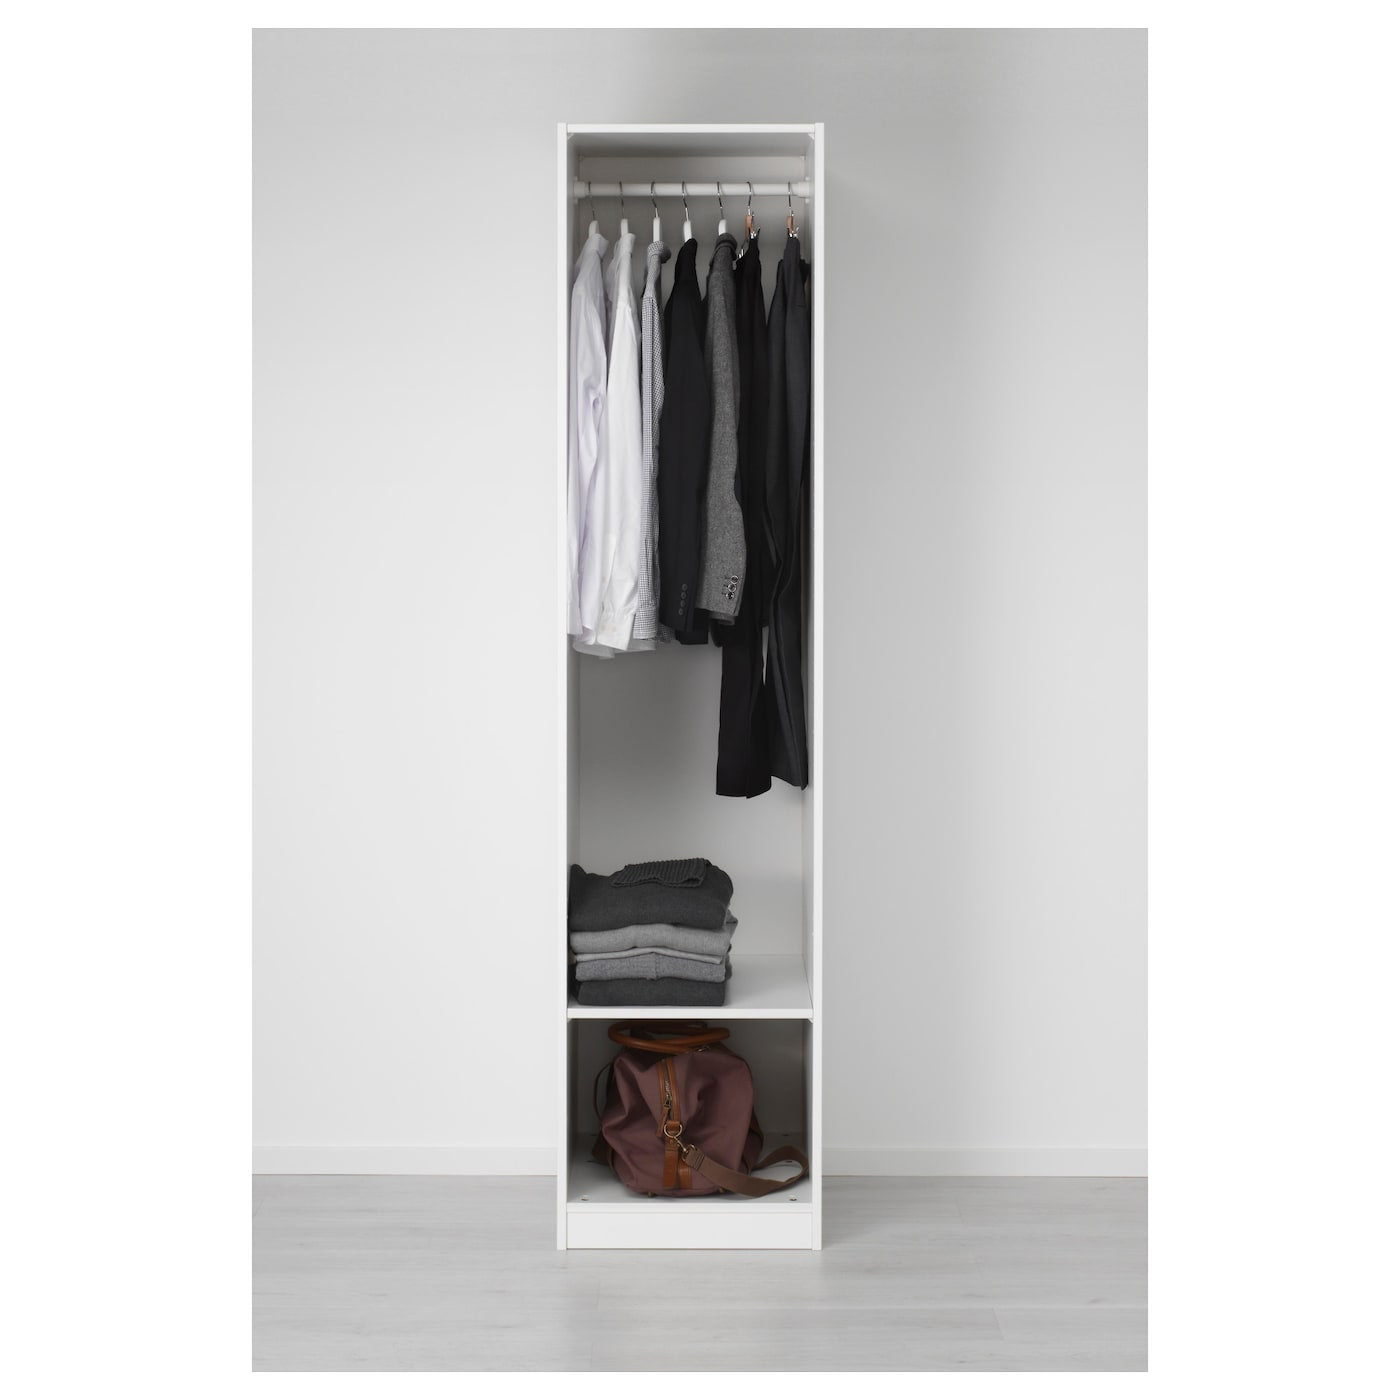 pax kledingkast wit vikedal spiegelglas 50 x 60 x 201 cm. Black Bedroom Furniture Sets. Home Design Ideas